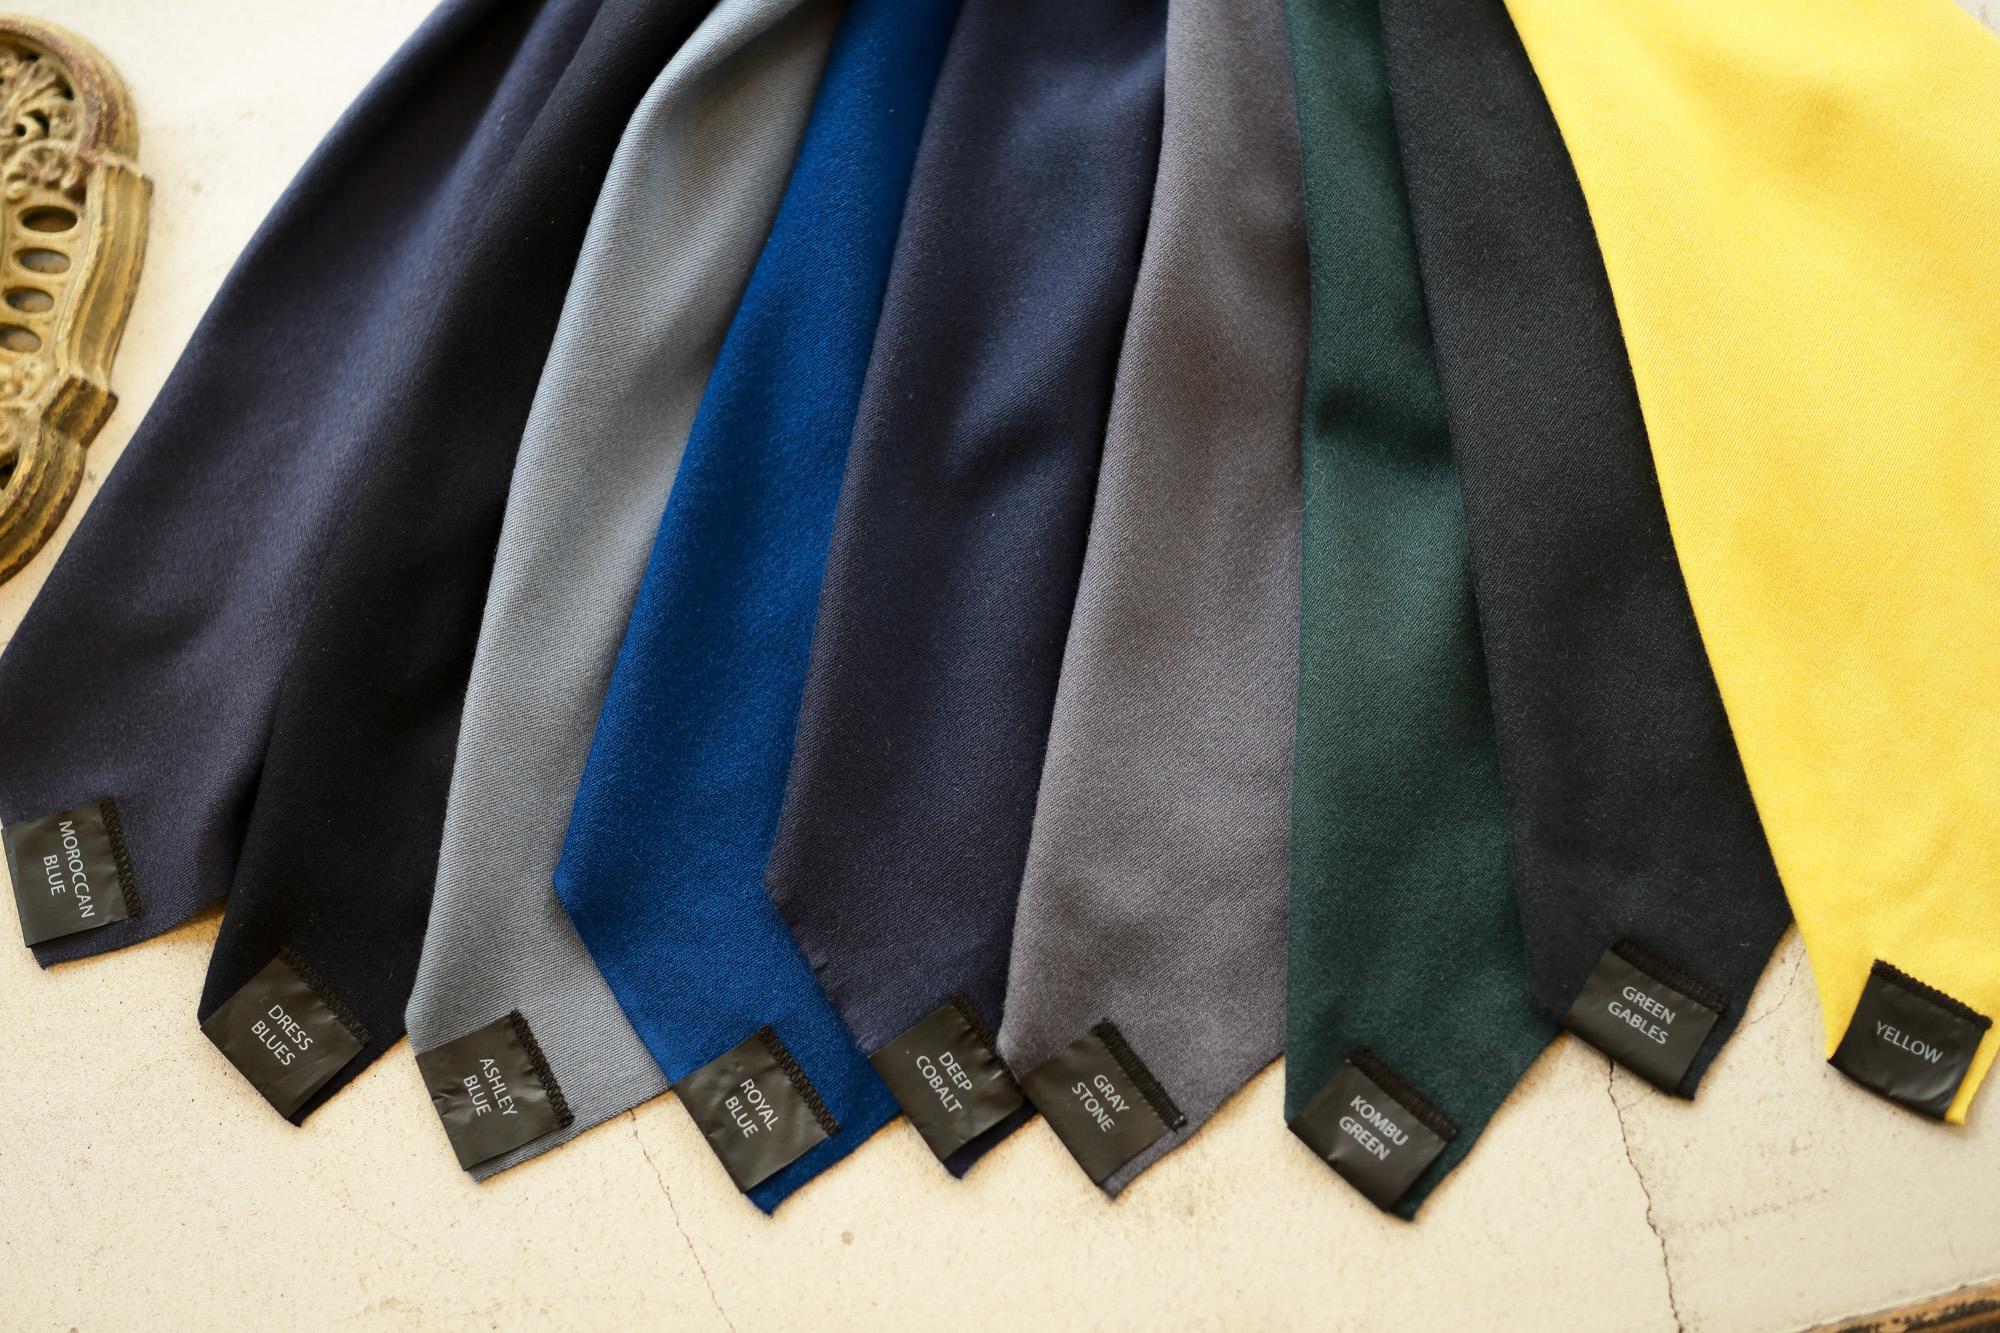 MANRICO CASHMERE (マンリコ カシミア) Summer Cashmere Crew Neck Knit (サマー カシミア クルーネック ニット) サマー カシミヤ ニット ロングスリーブ made in italy (イタリア製) 2021 春夏 【ご予約開始】【全26色】愛知 名古屋 Alto e Diritto アルトエデリット